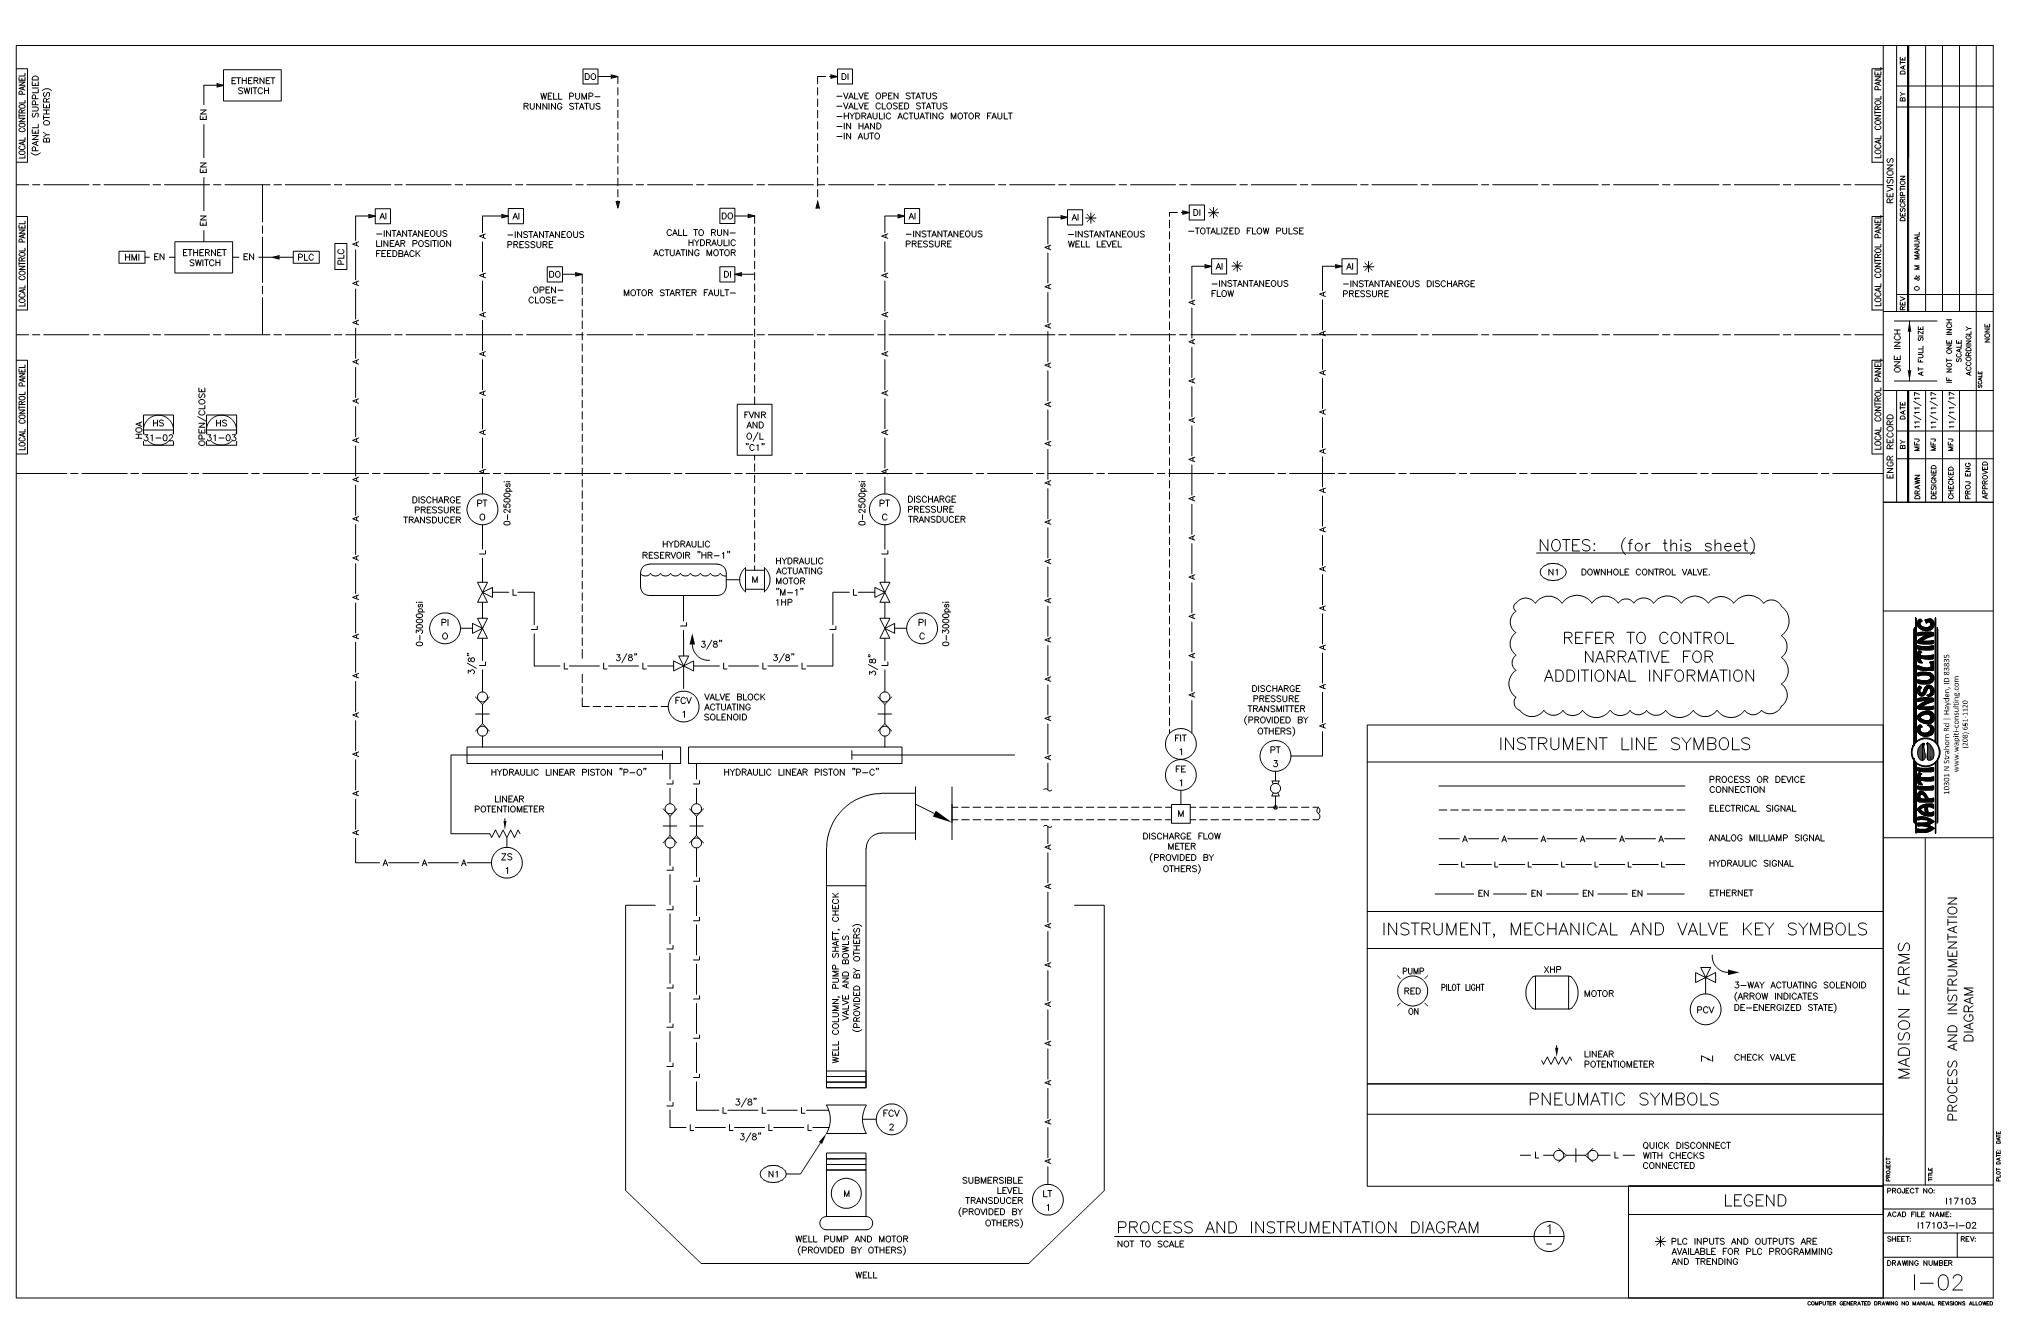 Process And Instrumentation Diagram  U2013 3r Valve